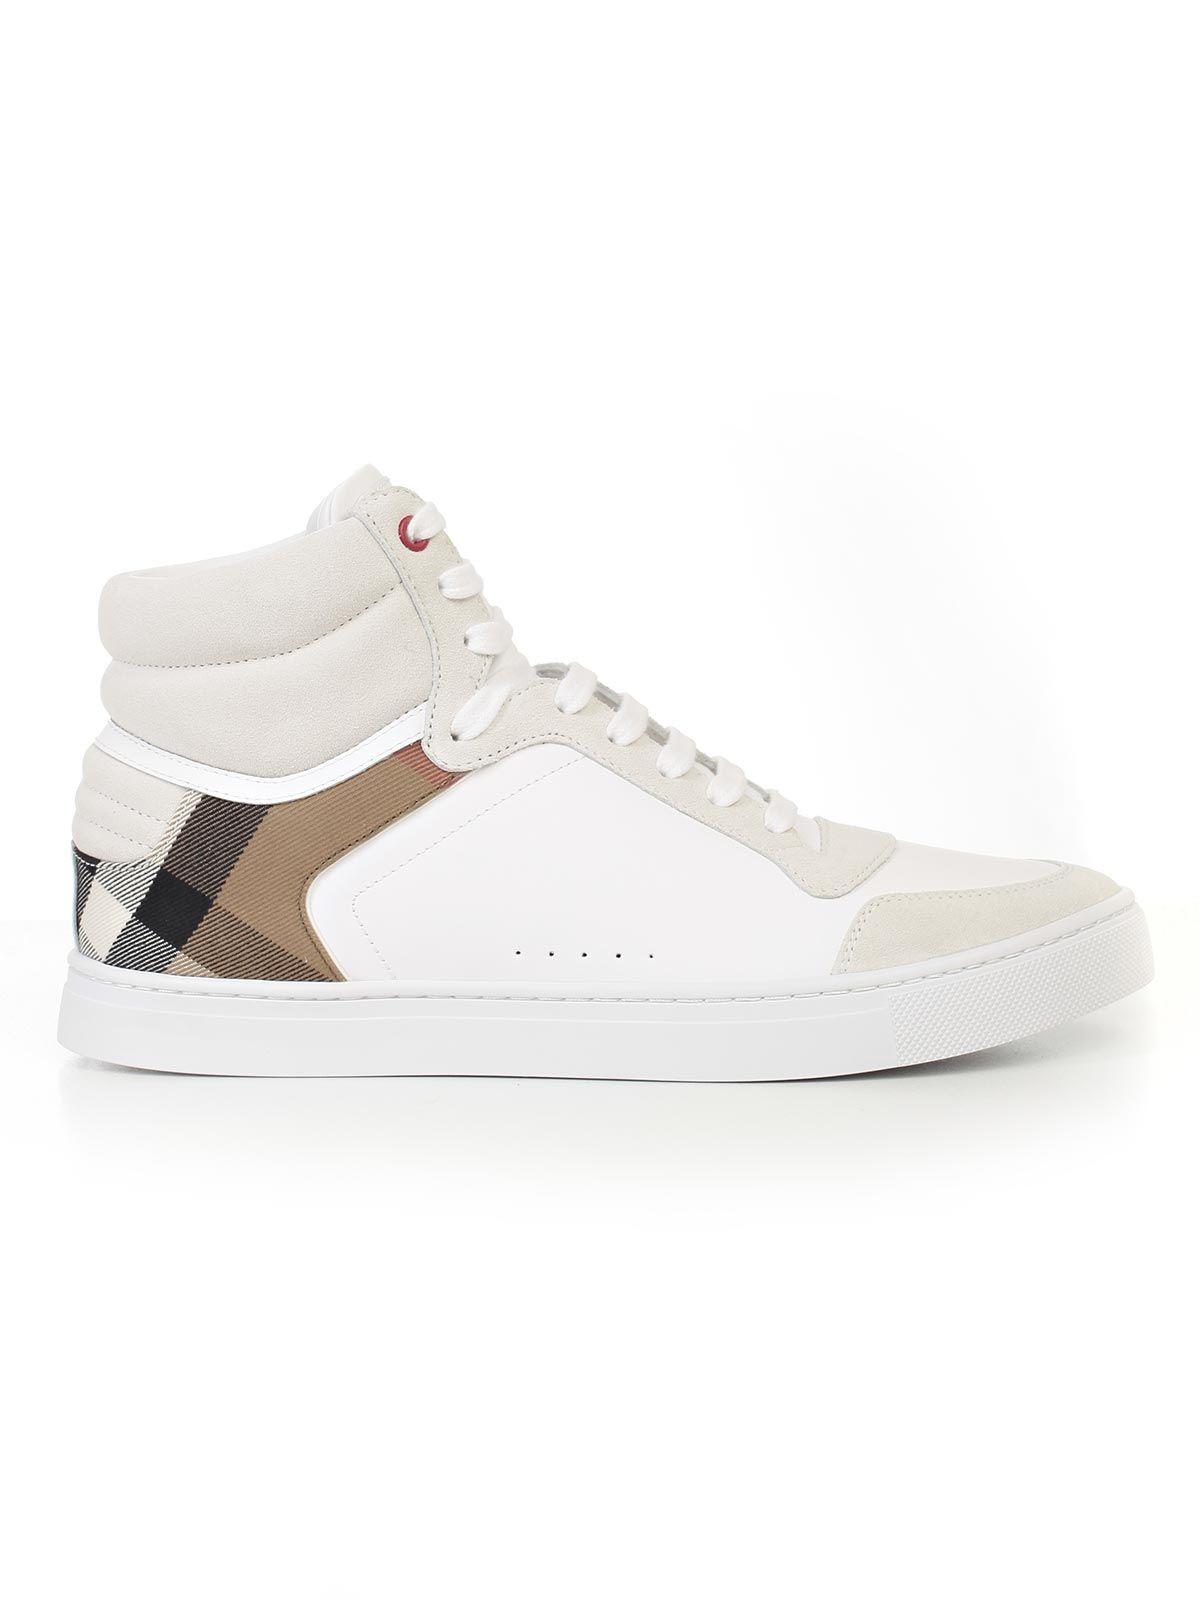 Burberry Sneakers